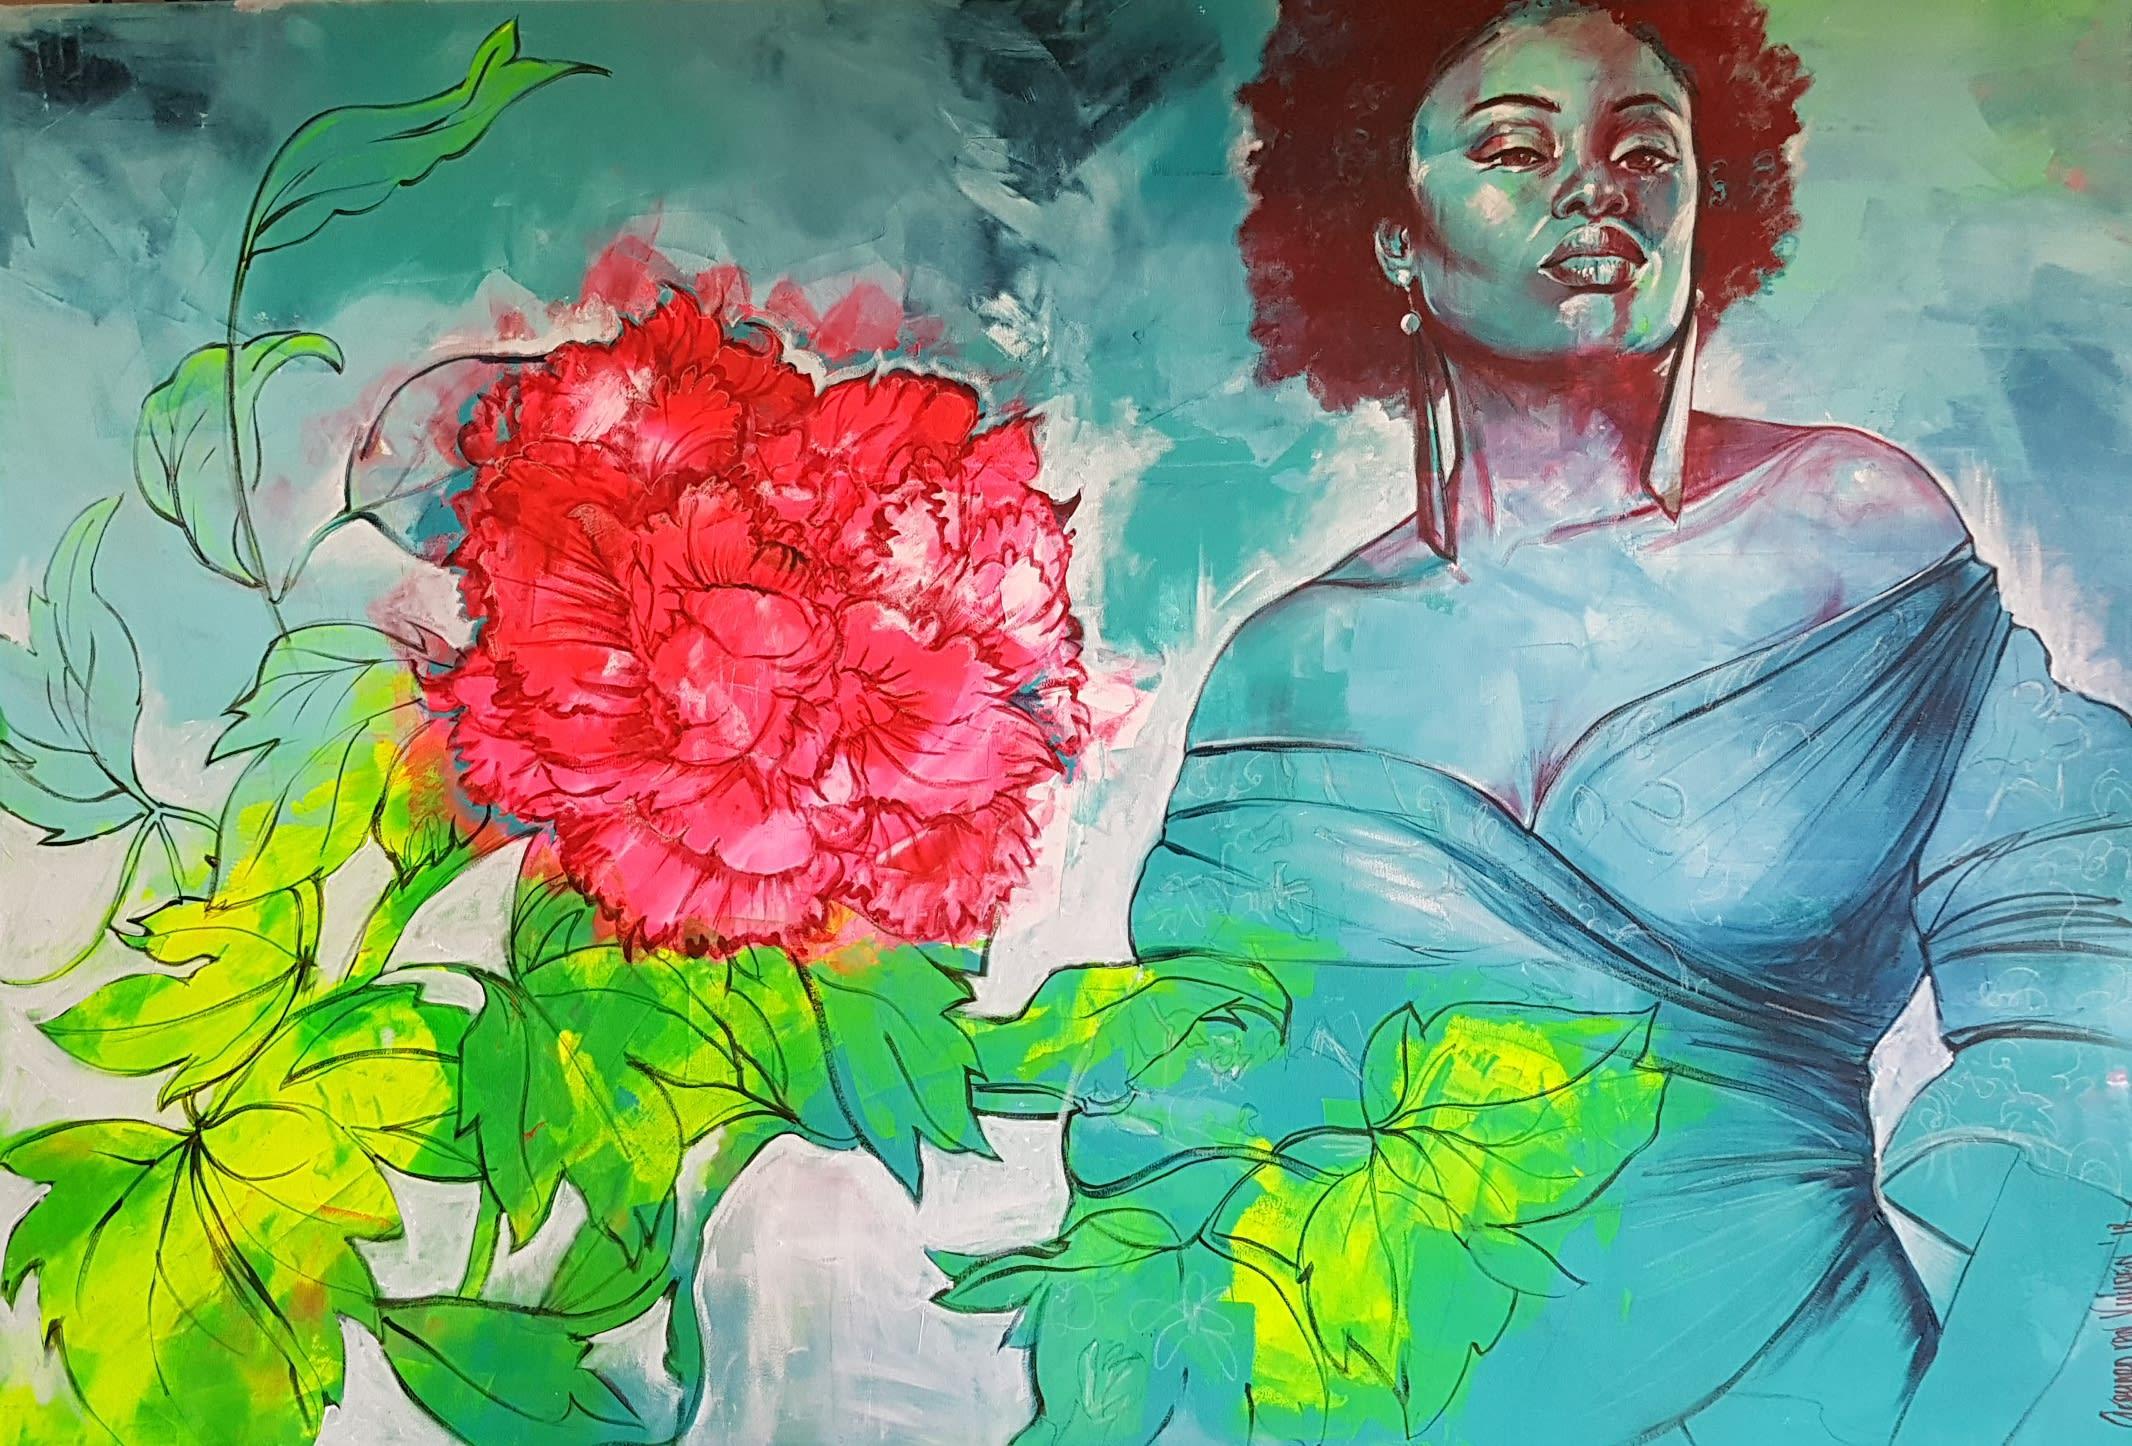 <span class=&#34;link fancybox-details-link&#34;><a href=&#34;/artworks/categories/121/2930-gerhard-van-vuuren-imbali-flower-2018/&#34;>View Detail Page</a></span><div class=&#34;artist&#34;><strong>Gerhard Van Vuuren</strong></div> <div class=&#34;title&#34;><em>Imbali (Flower)</em>, 2018</div> <div class=&#34;medium&#34;>Acrylic On Canvas</div> <div class=&#34;dimensions&#34;>150cm x 220cm x 5cm</div><div class=&#34;price&#34;>R26,900.00</div>